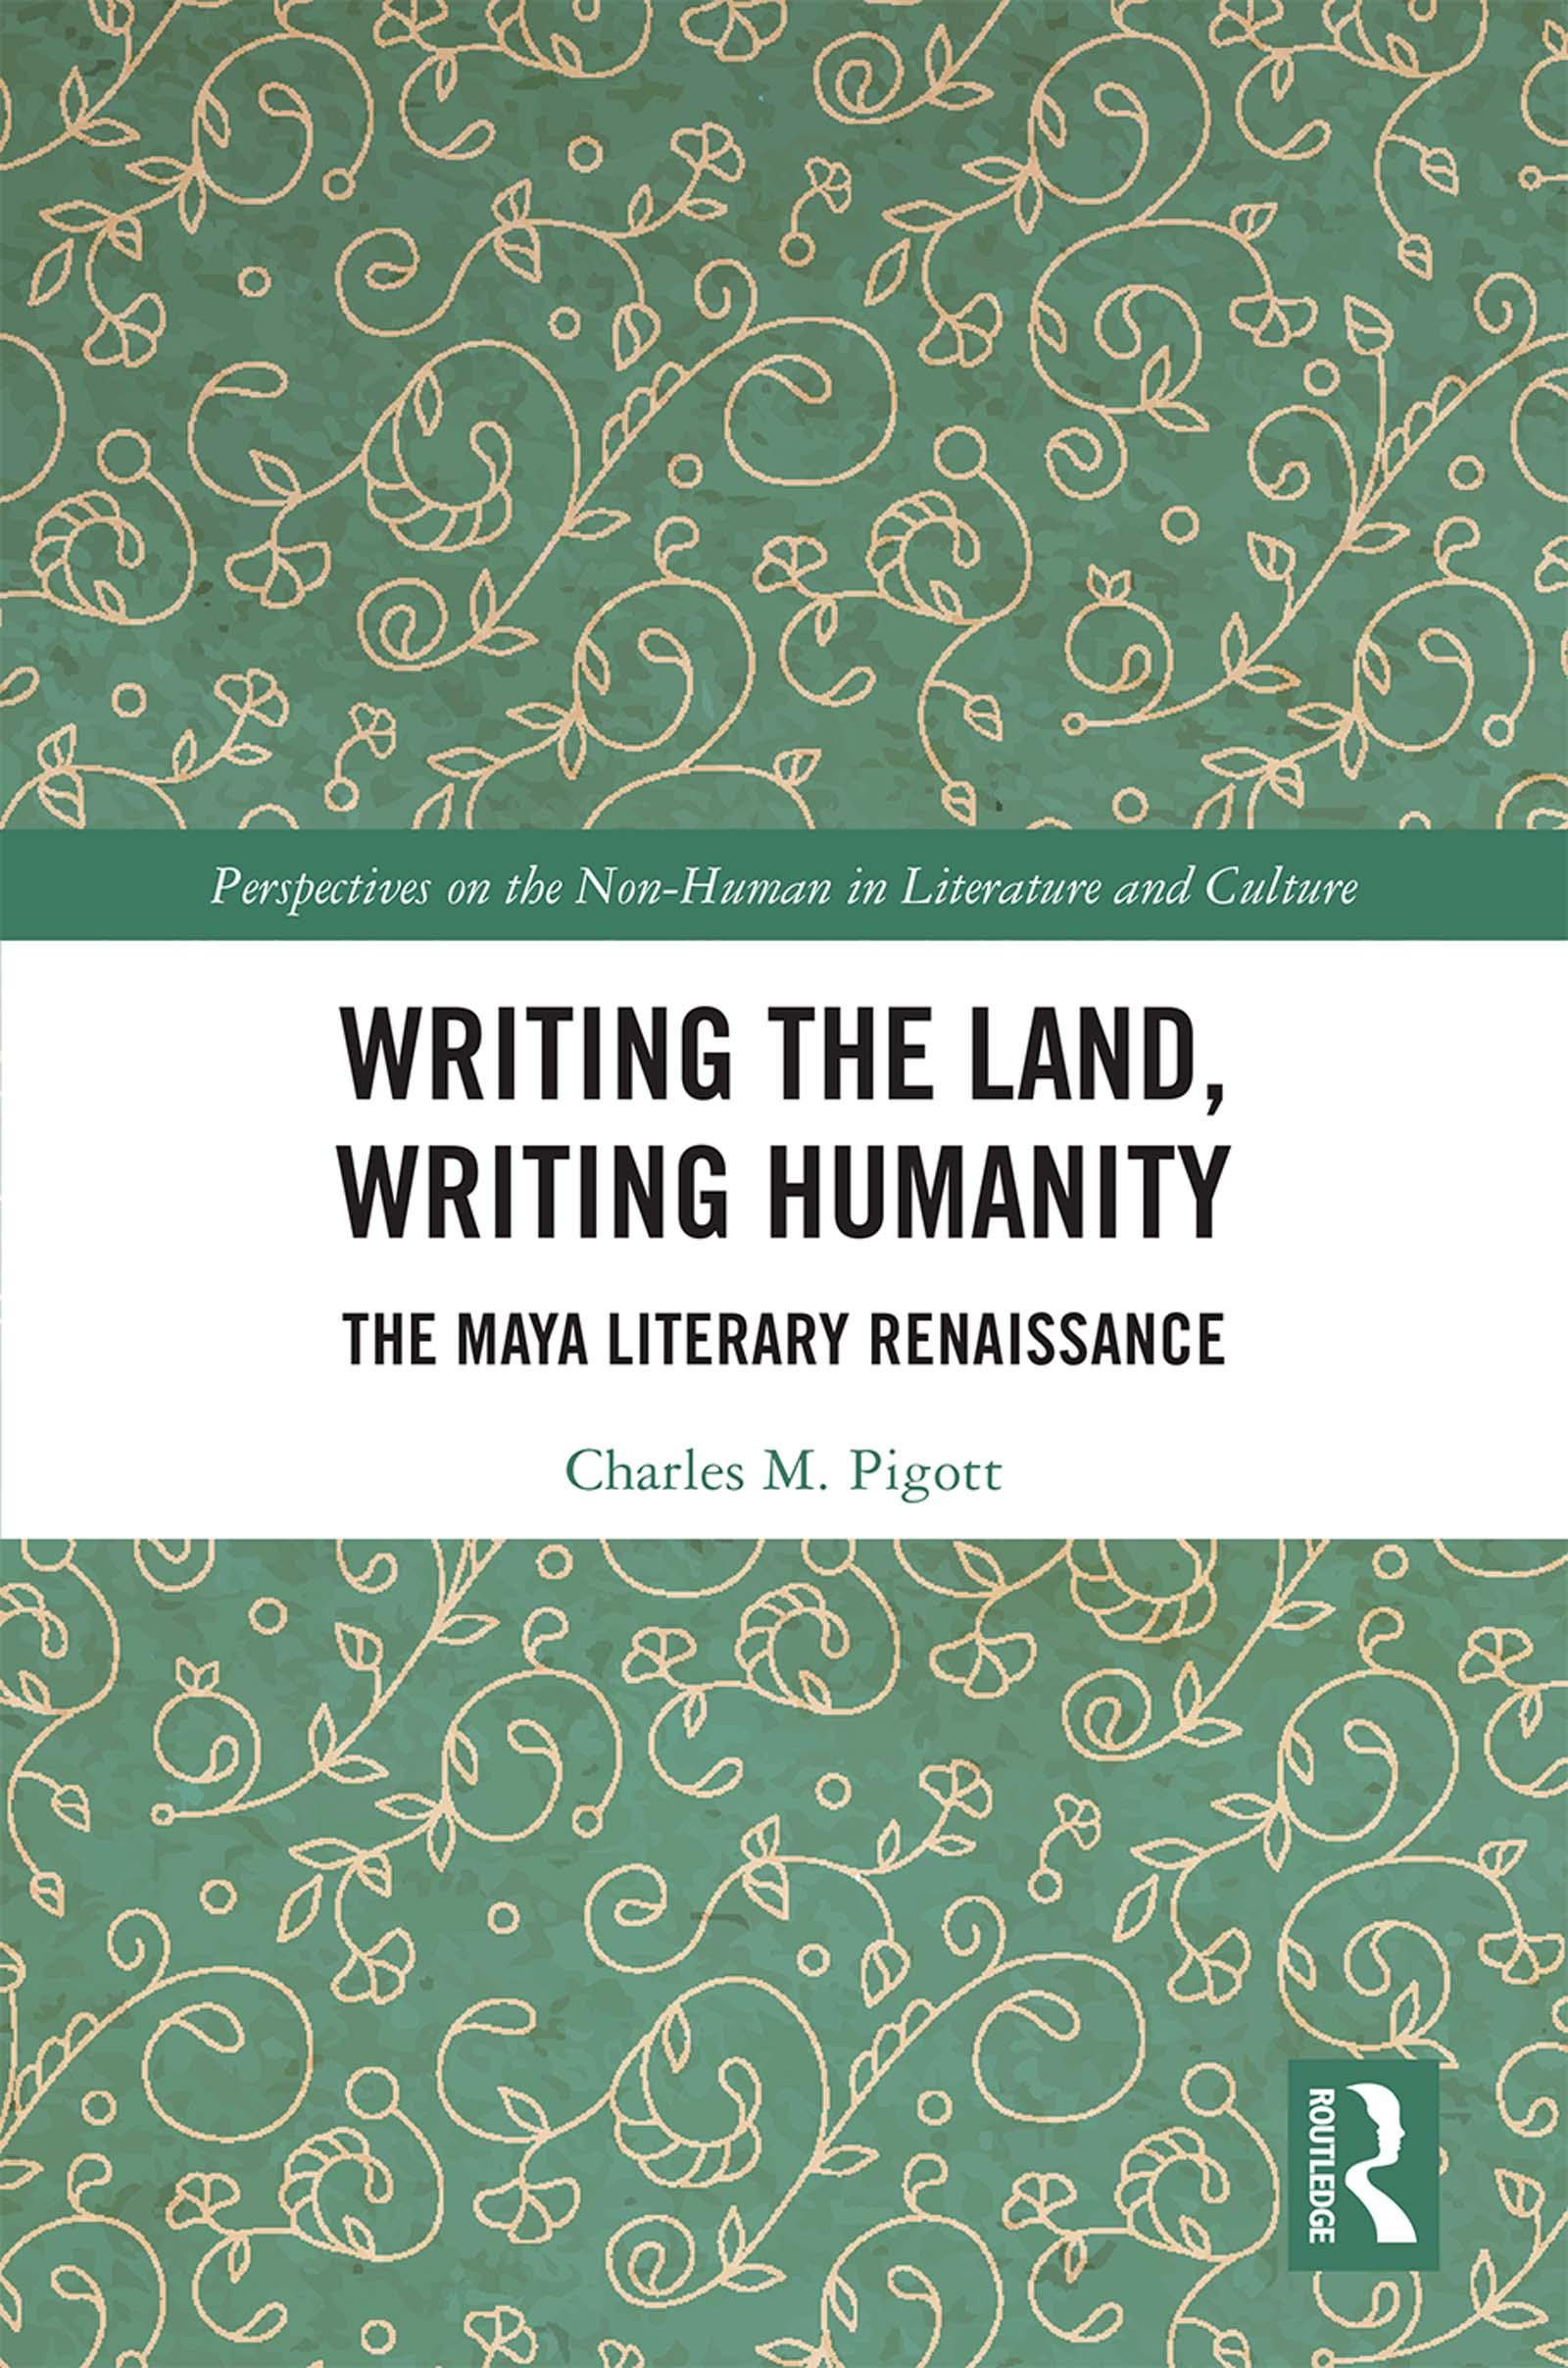 Writing the Land, Writing Humanity: The Maya Literary Renaissance book cover